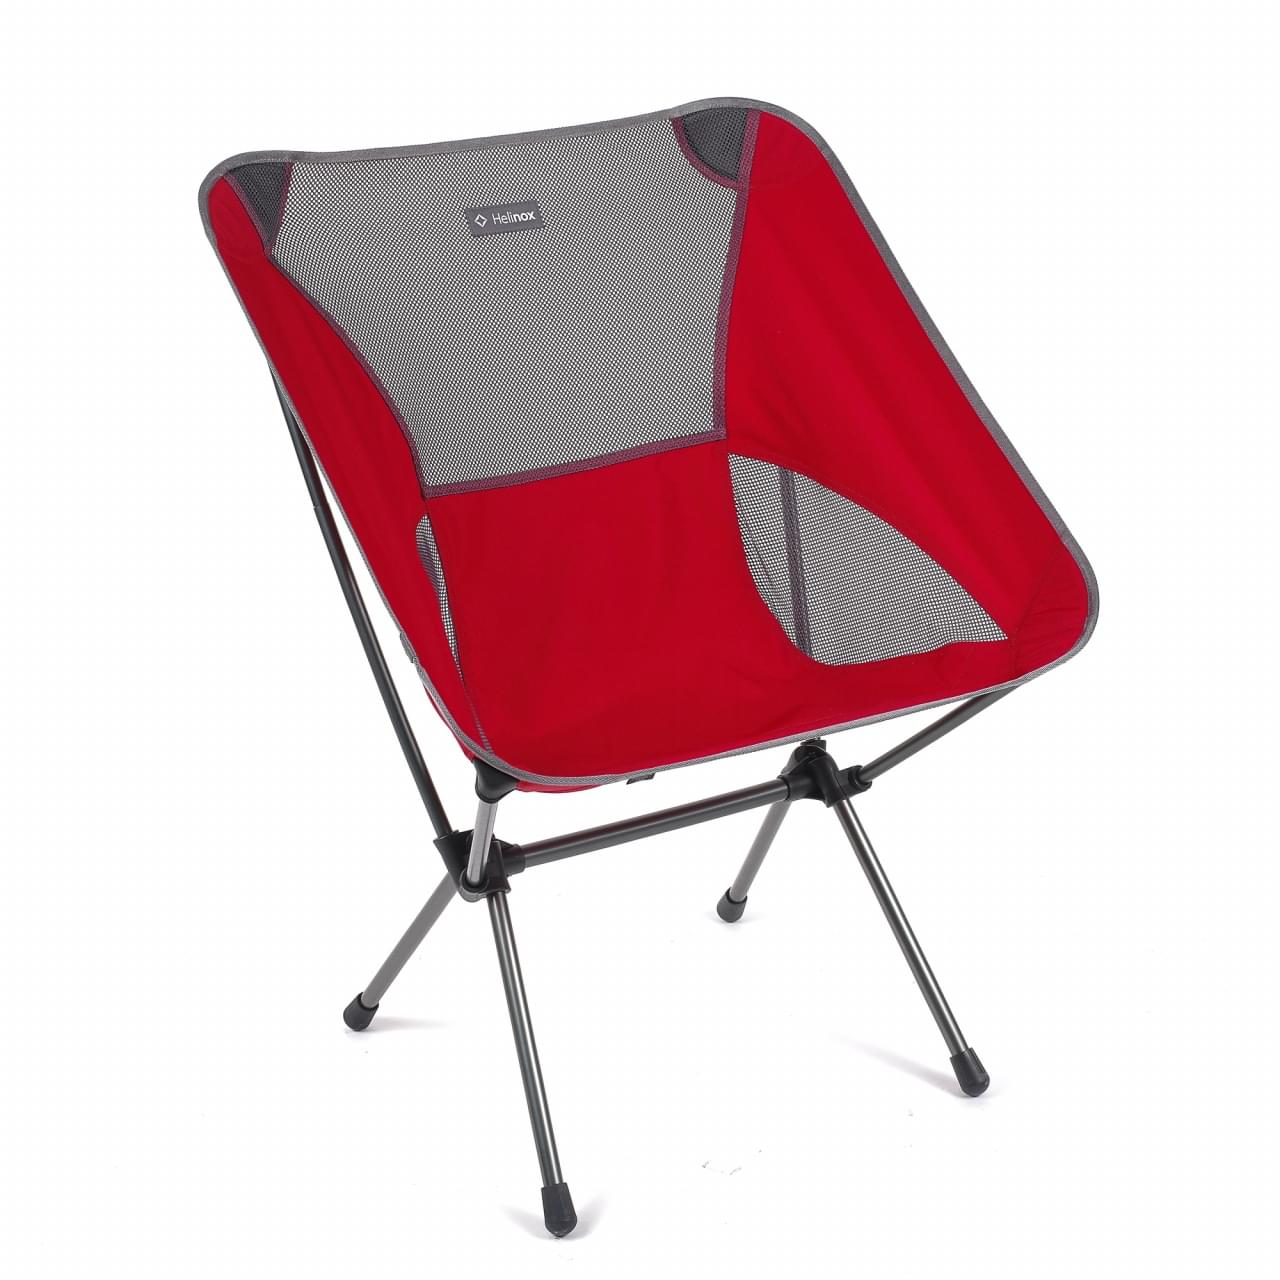 Helinox Chair One XL Lichtgewicht Stoel Rood